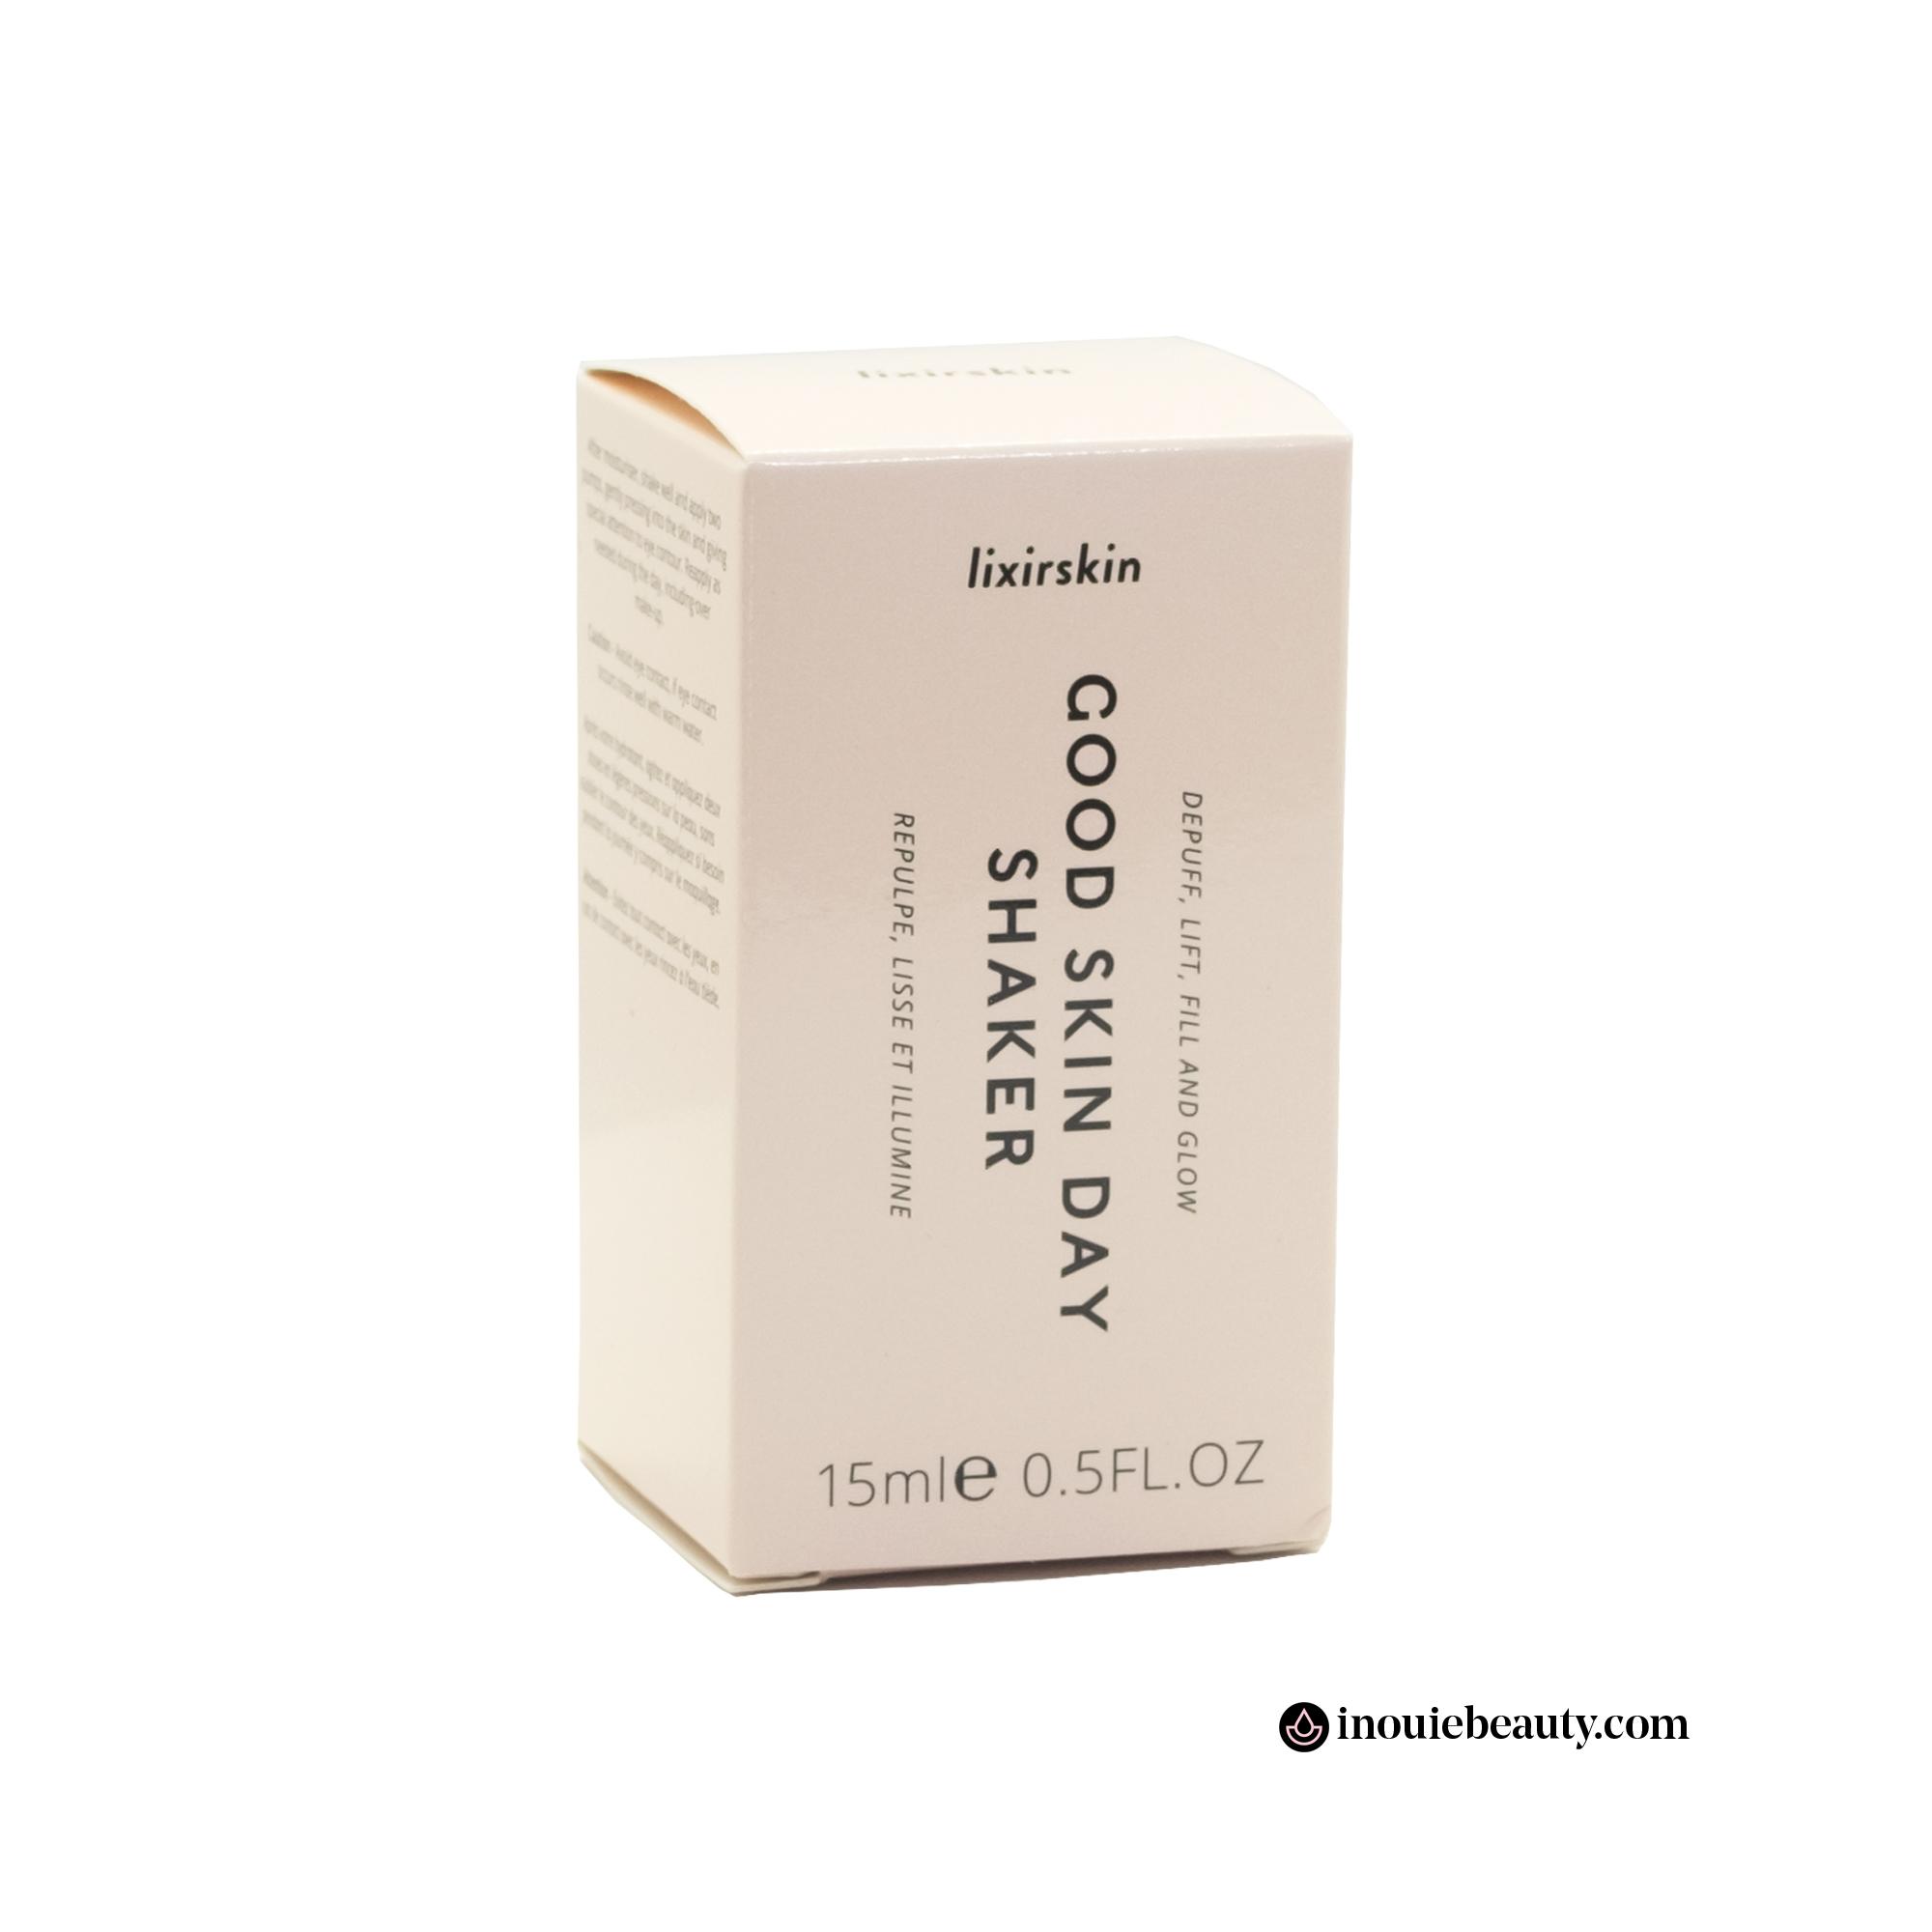 Lixirskin Good Skin Shaker